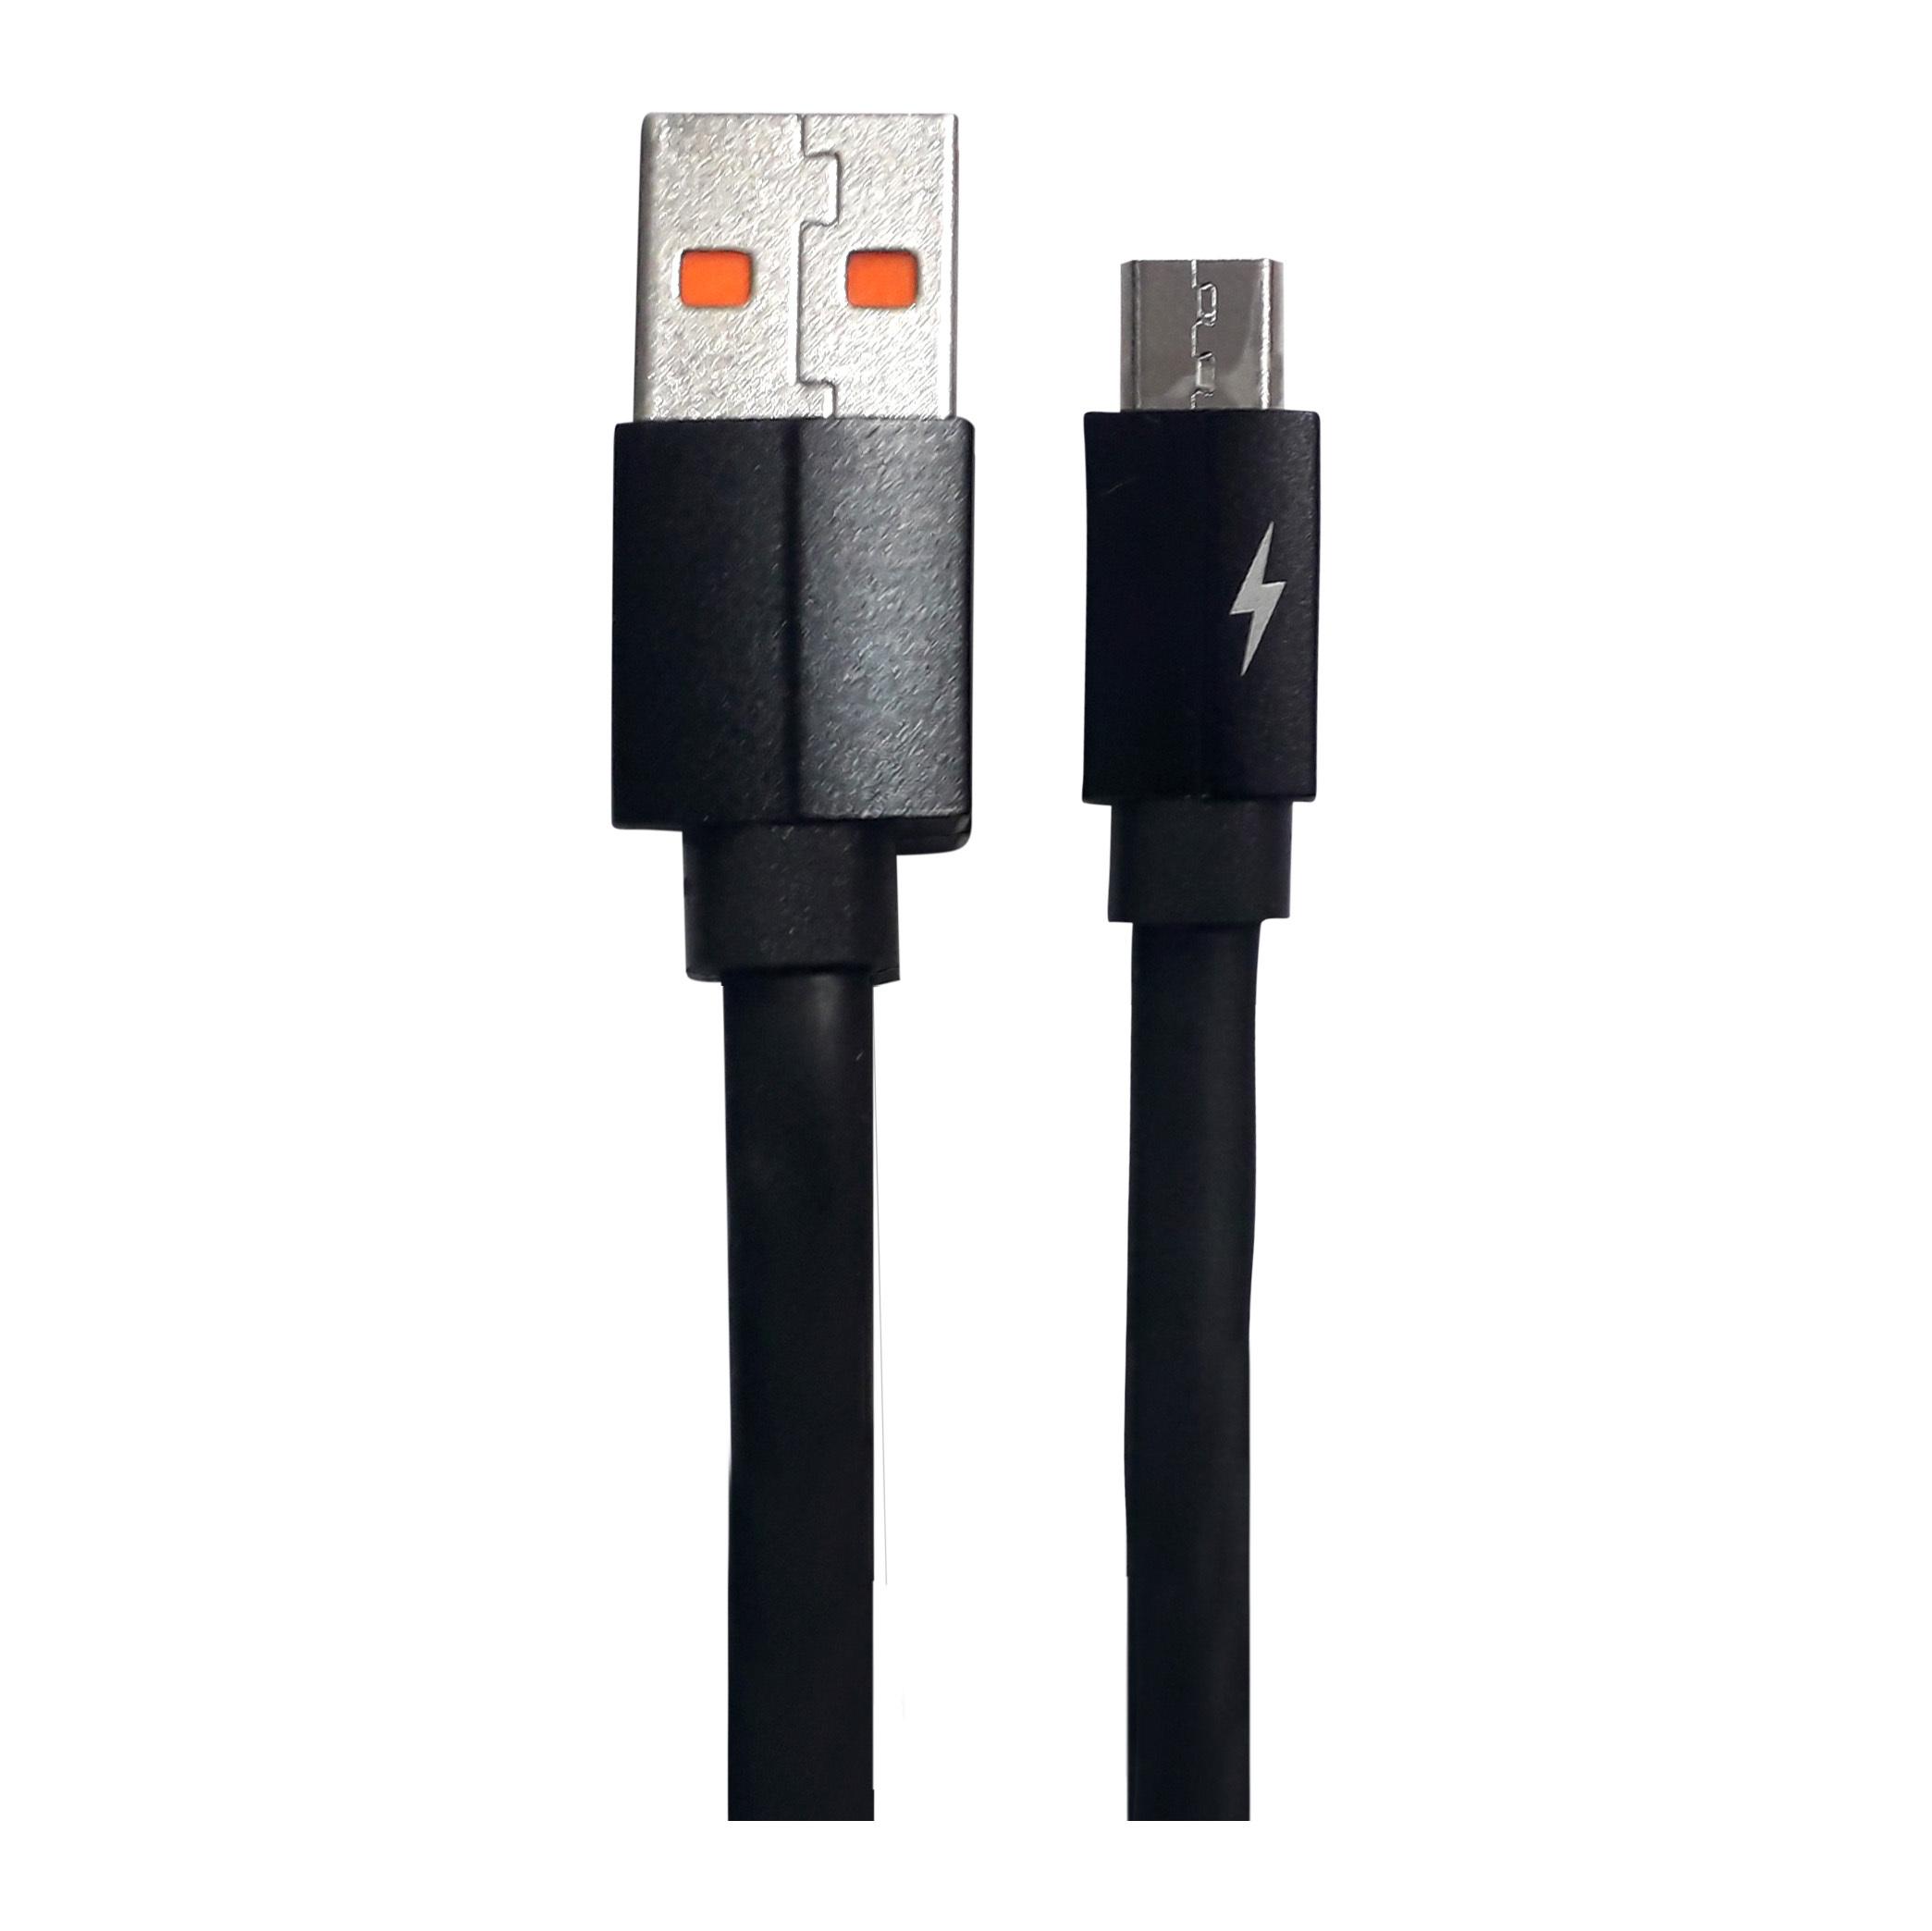 USB-ZC02